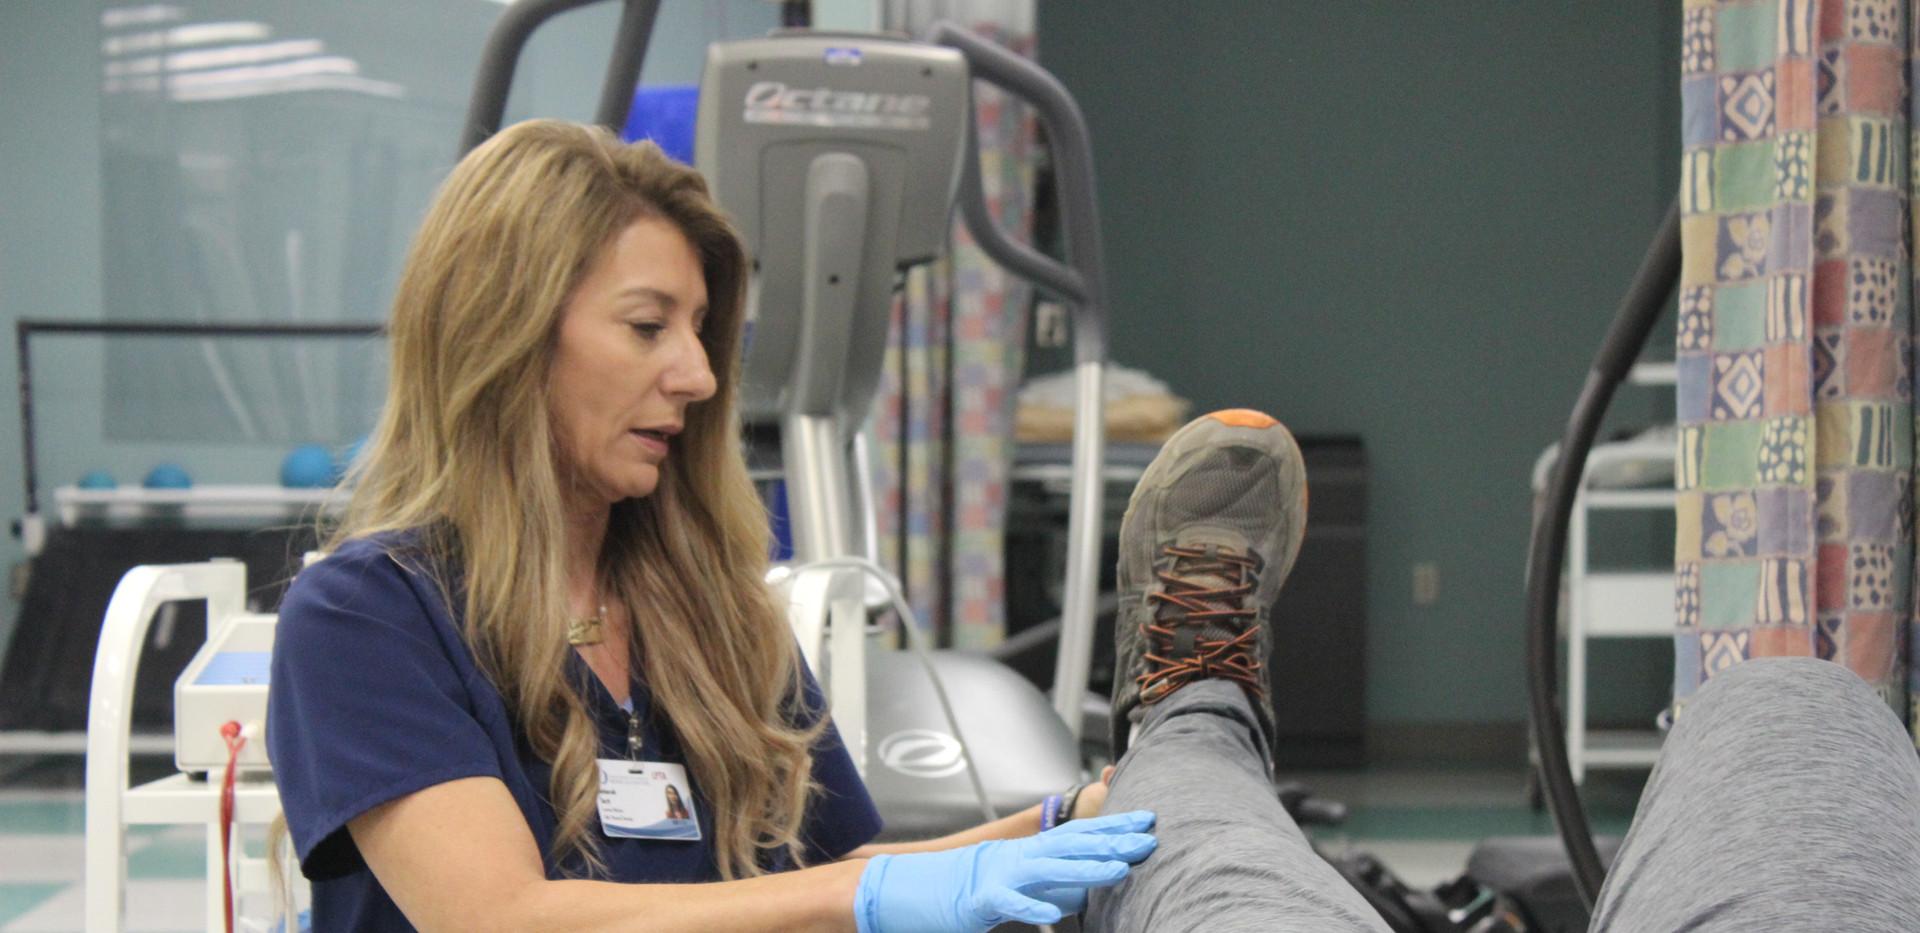 Deborah Tartt, PT, assisting a patient at UMMC-Grenada in Grenada, MS.